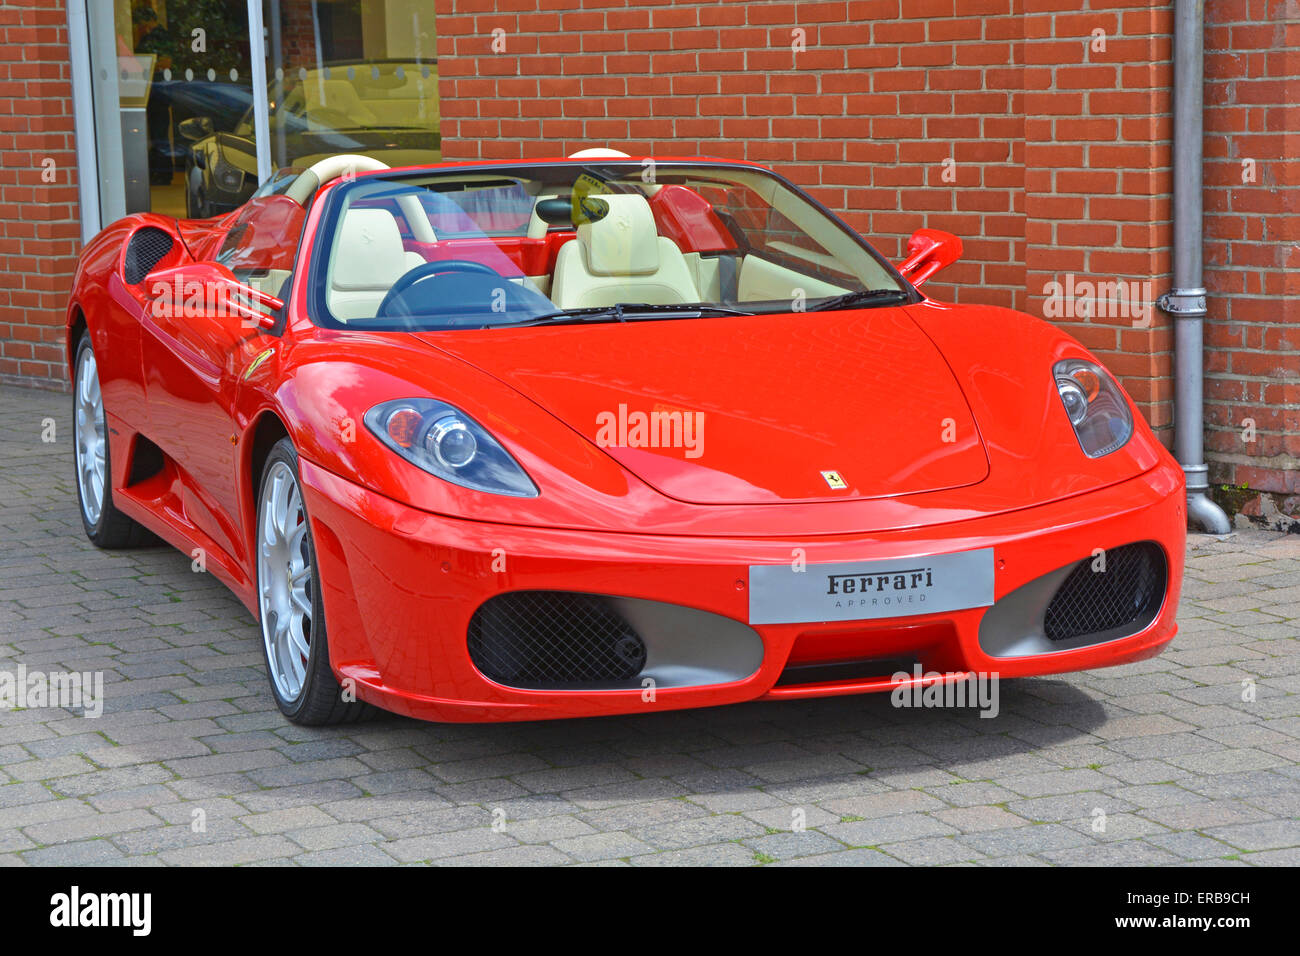 Ferrari Dealership Car Stock Photos & Ferrari Dealership Car Stock